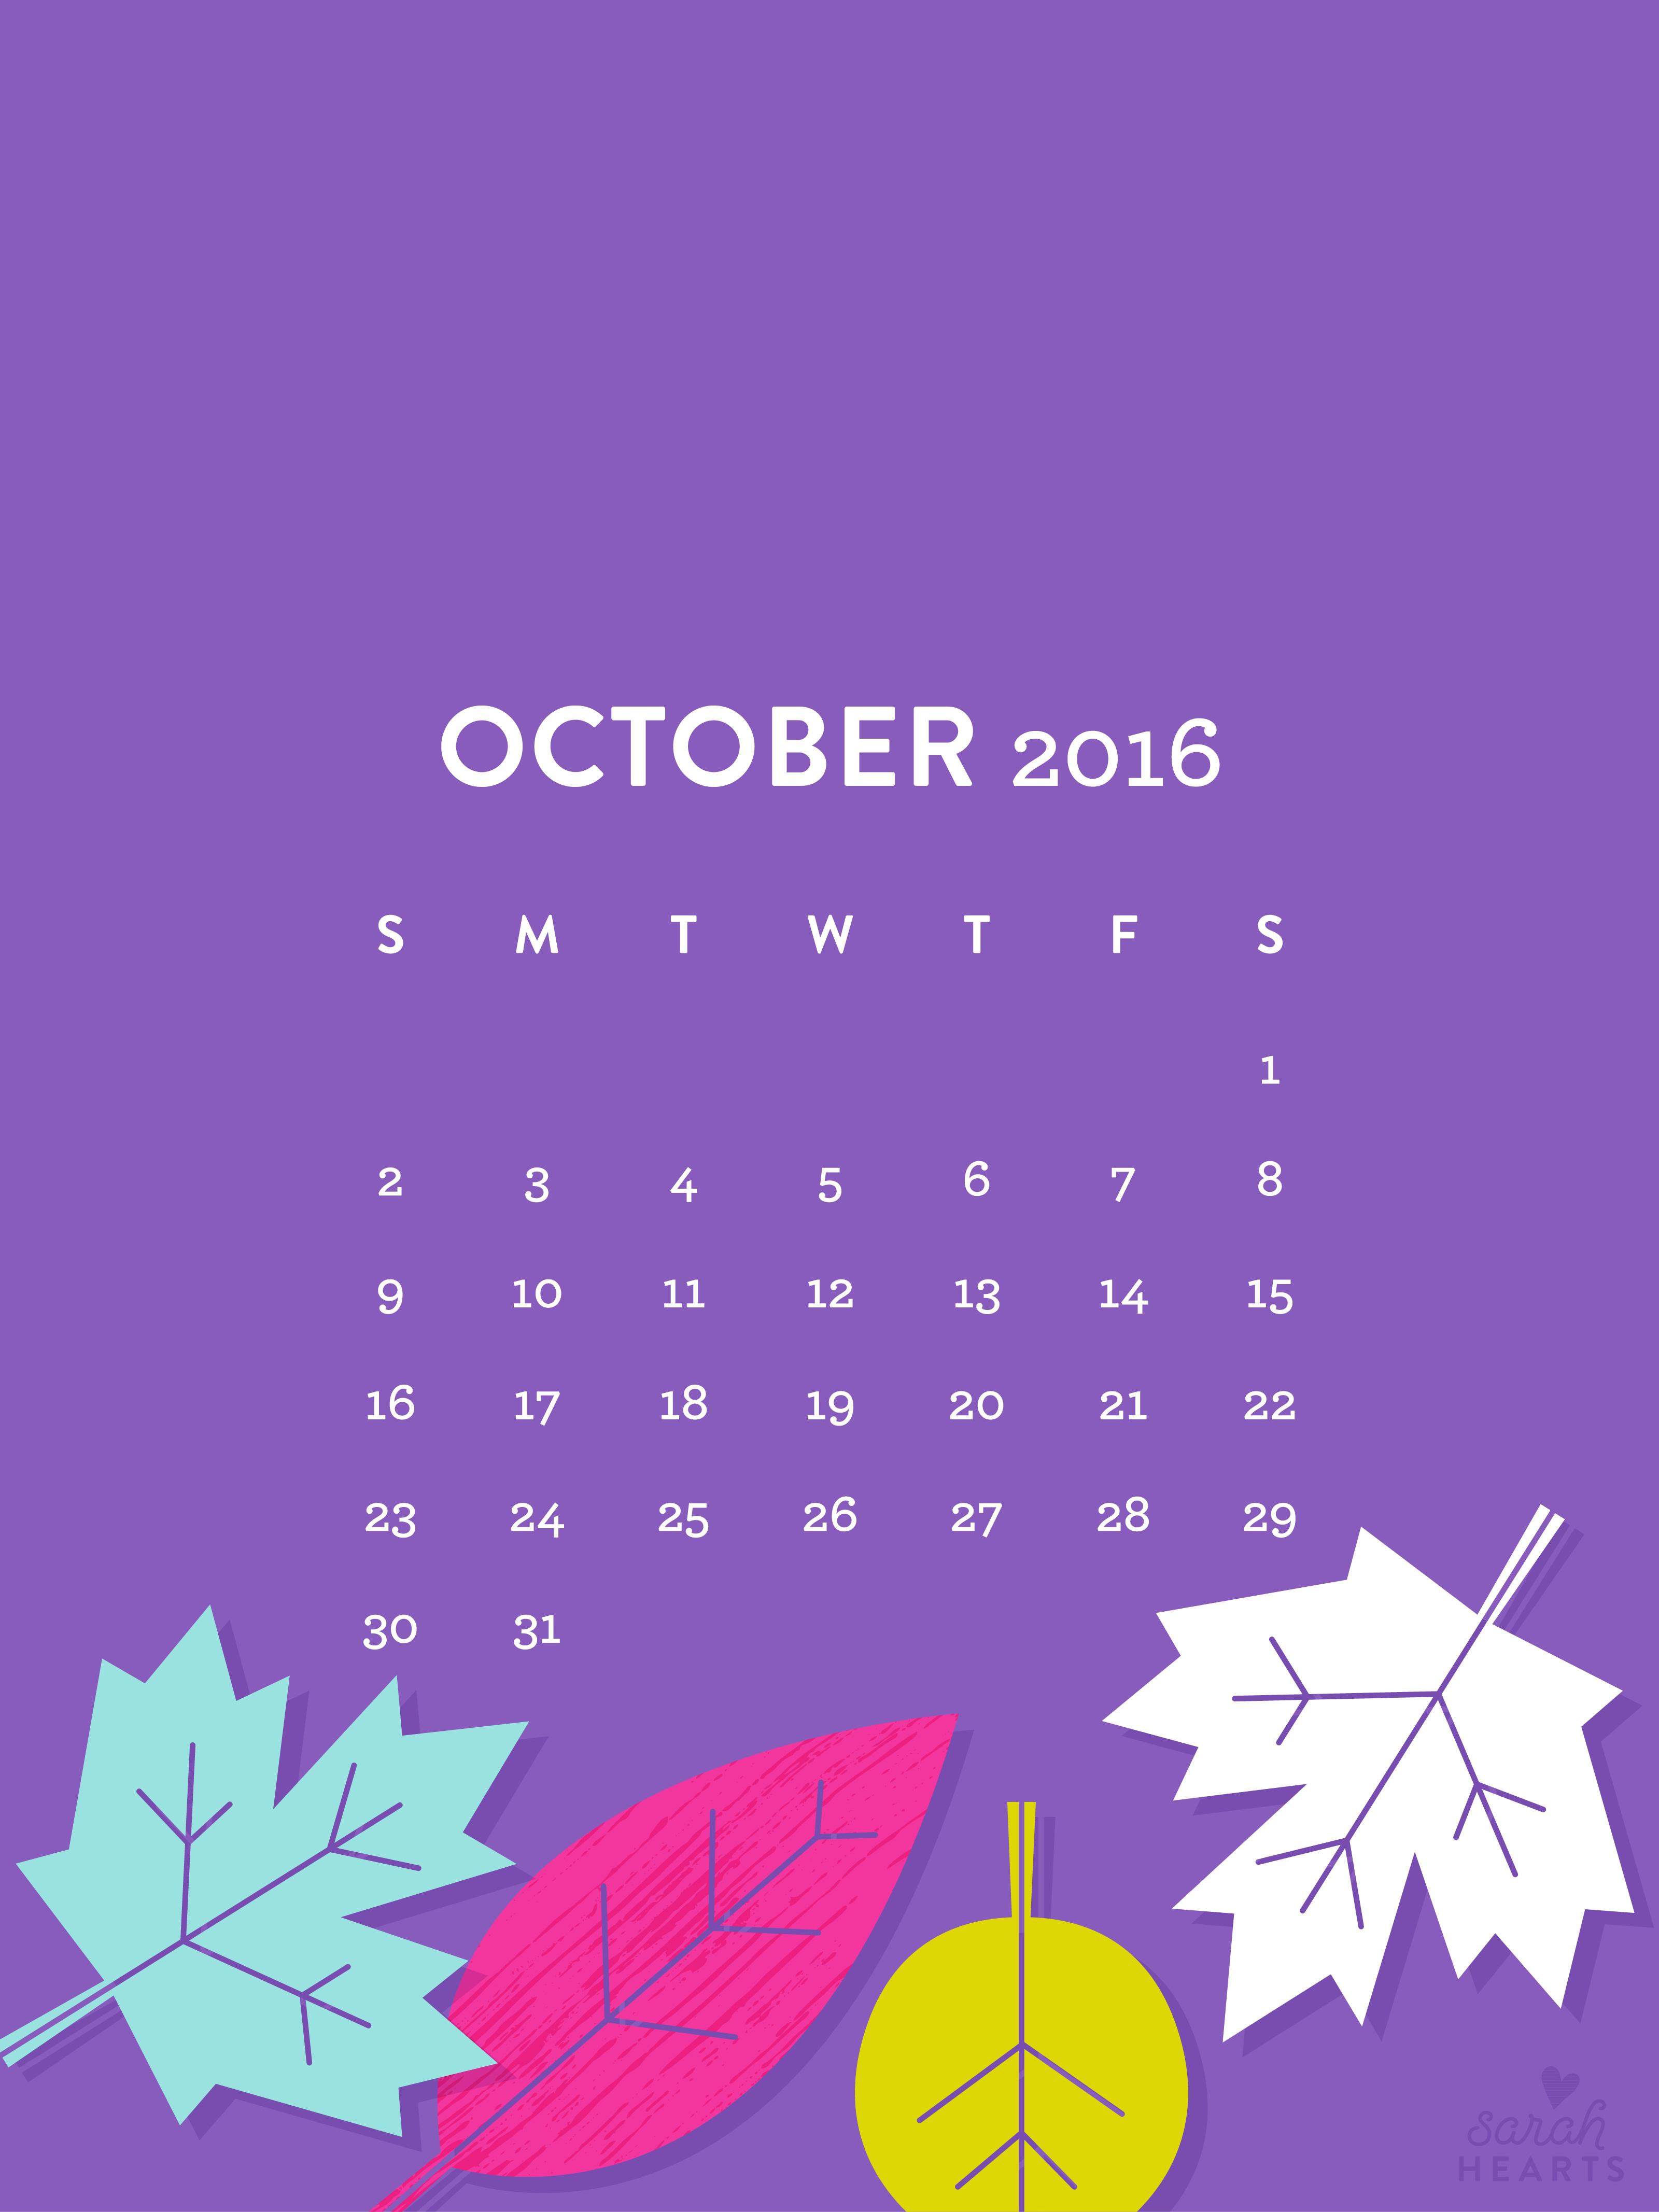 Nove Ber Fall Wallpaper For Computer October 2016 Fall Leaves Calendar Wallpapers Sarah Hearts